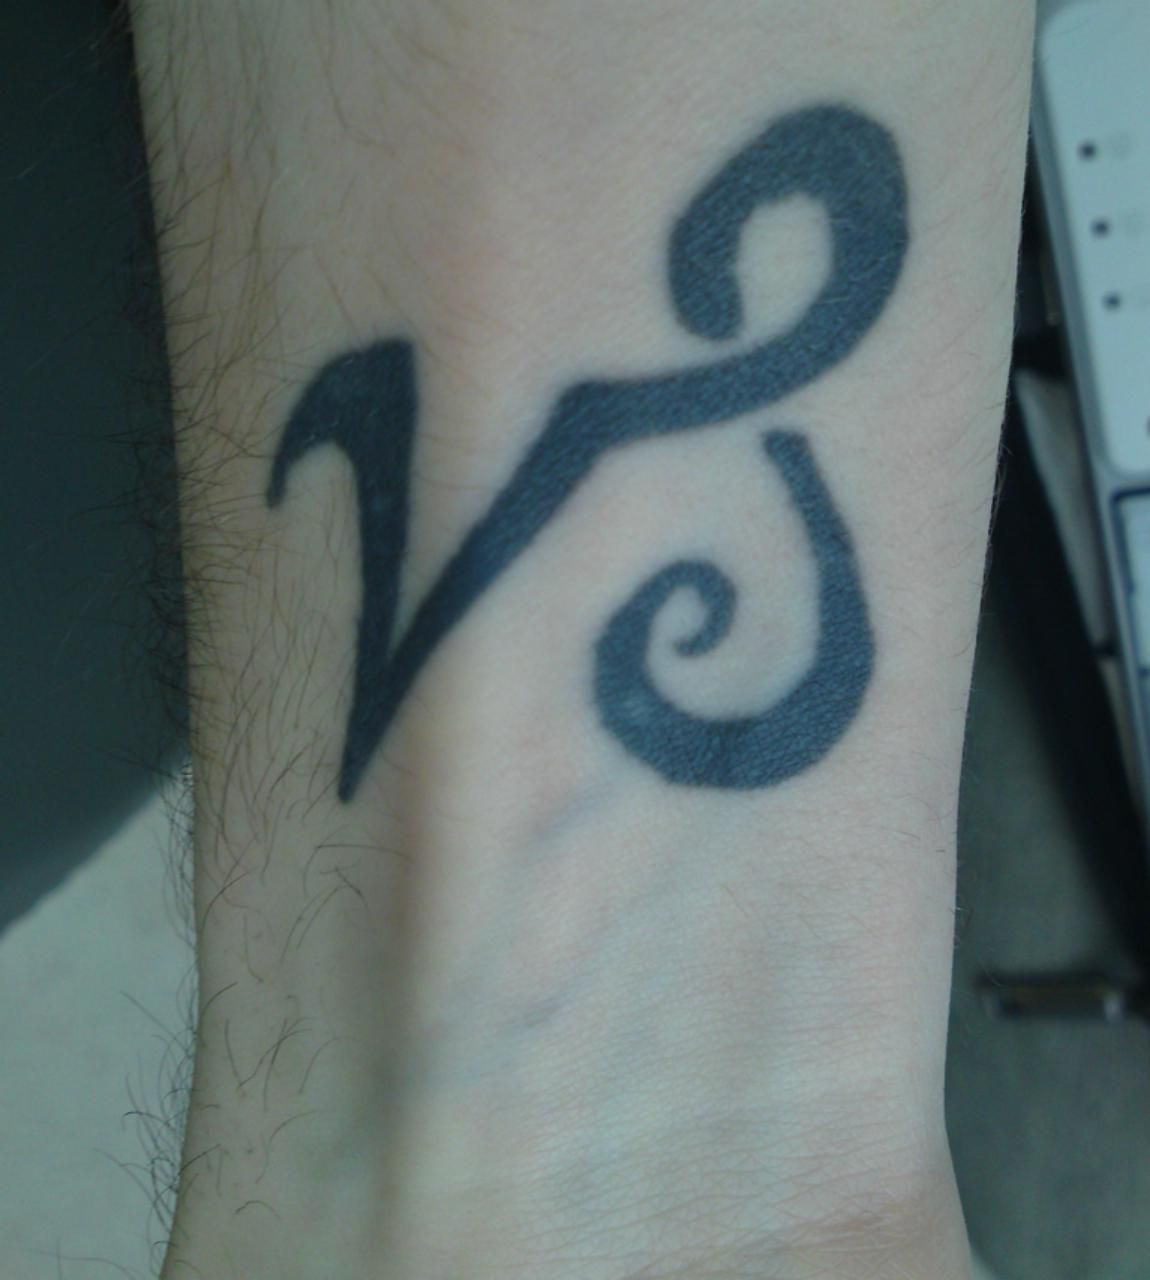 How do i choose a meaningful tattoo meaningful inner wrist tattoo ideas biocorpaavc Gallery